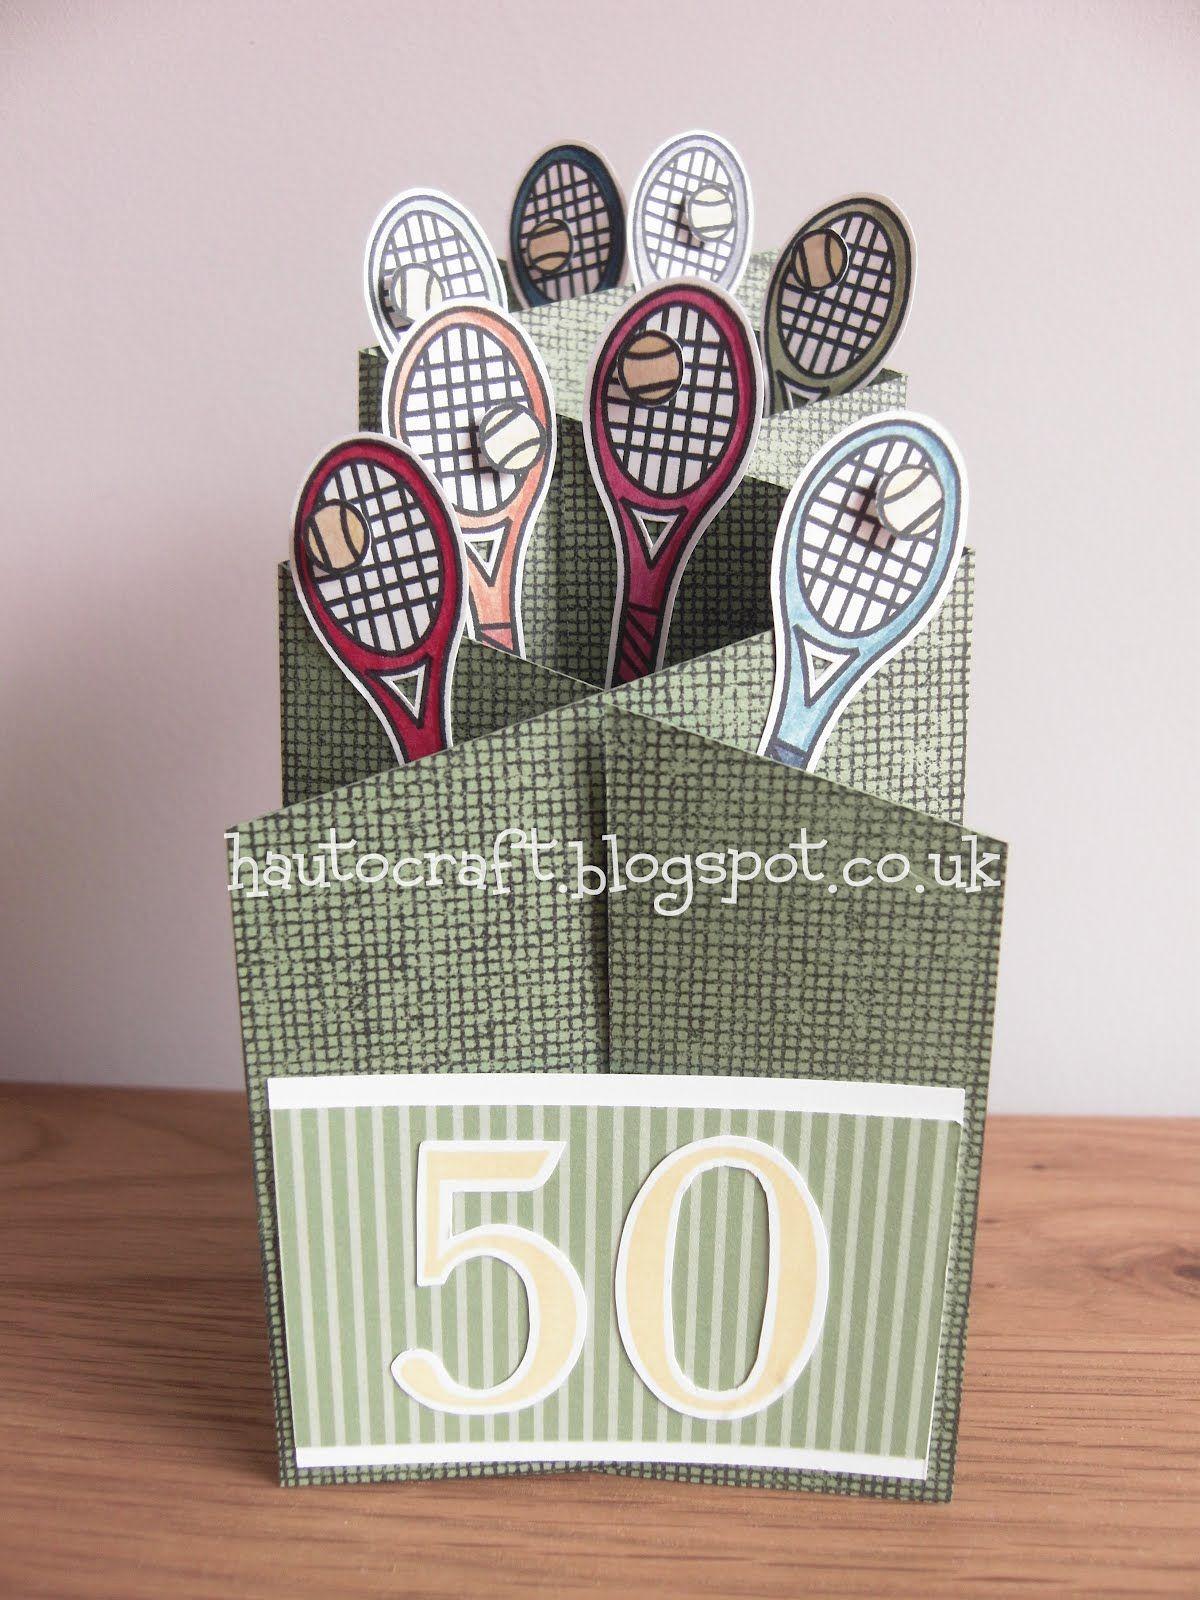 Tennis Birthday Cards Google Search Creative Cards Pinterest